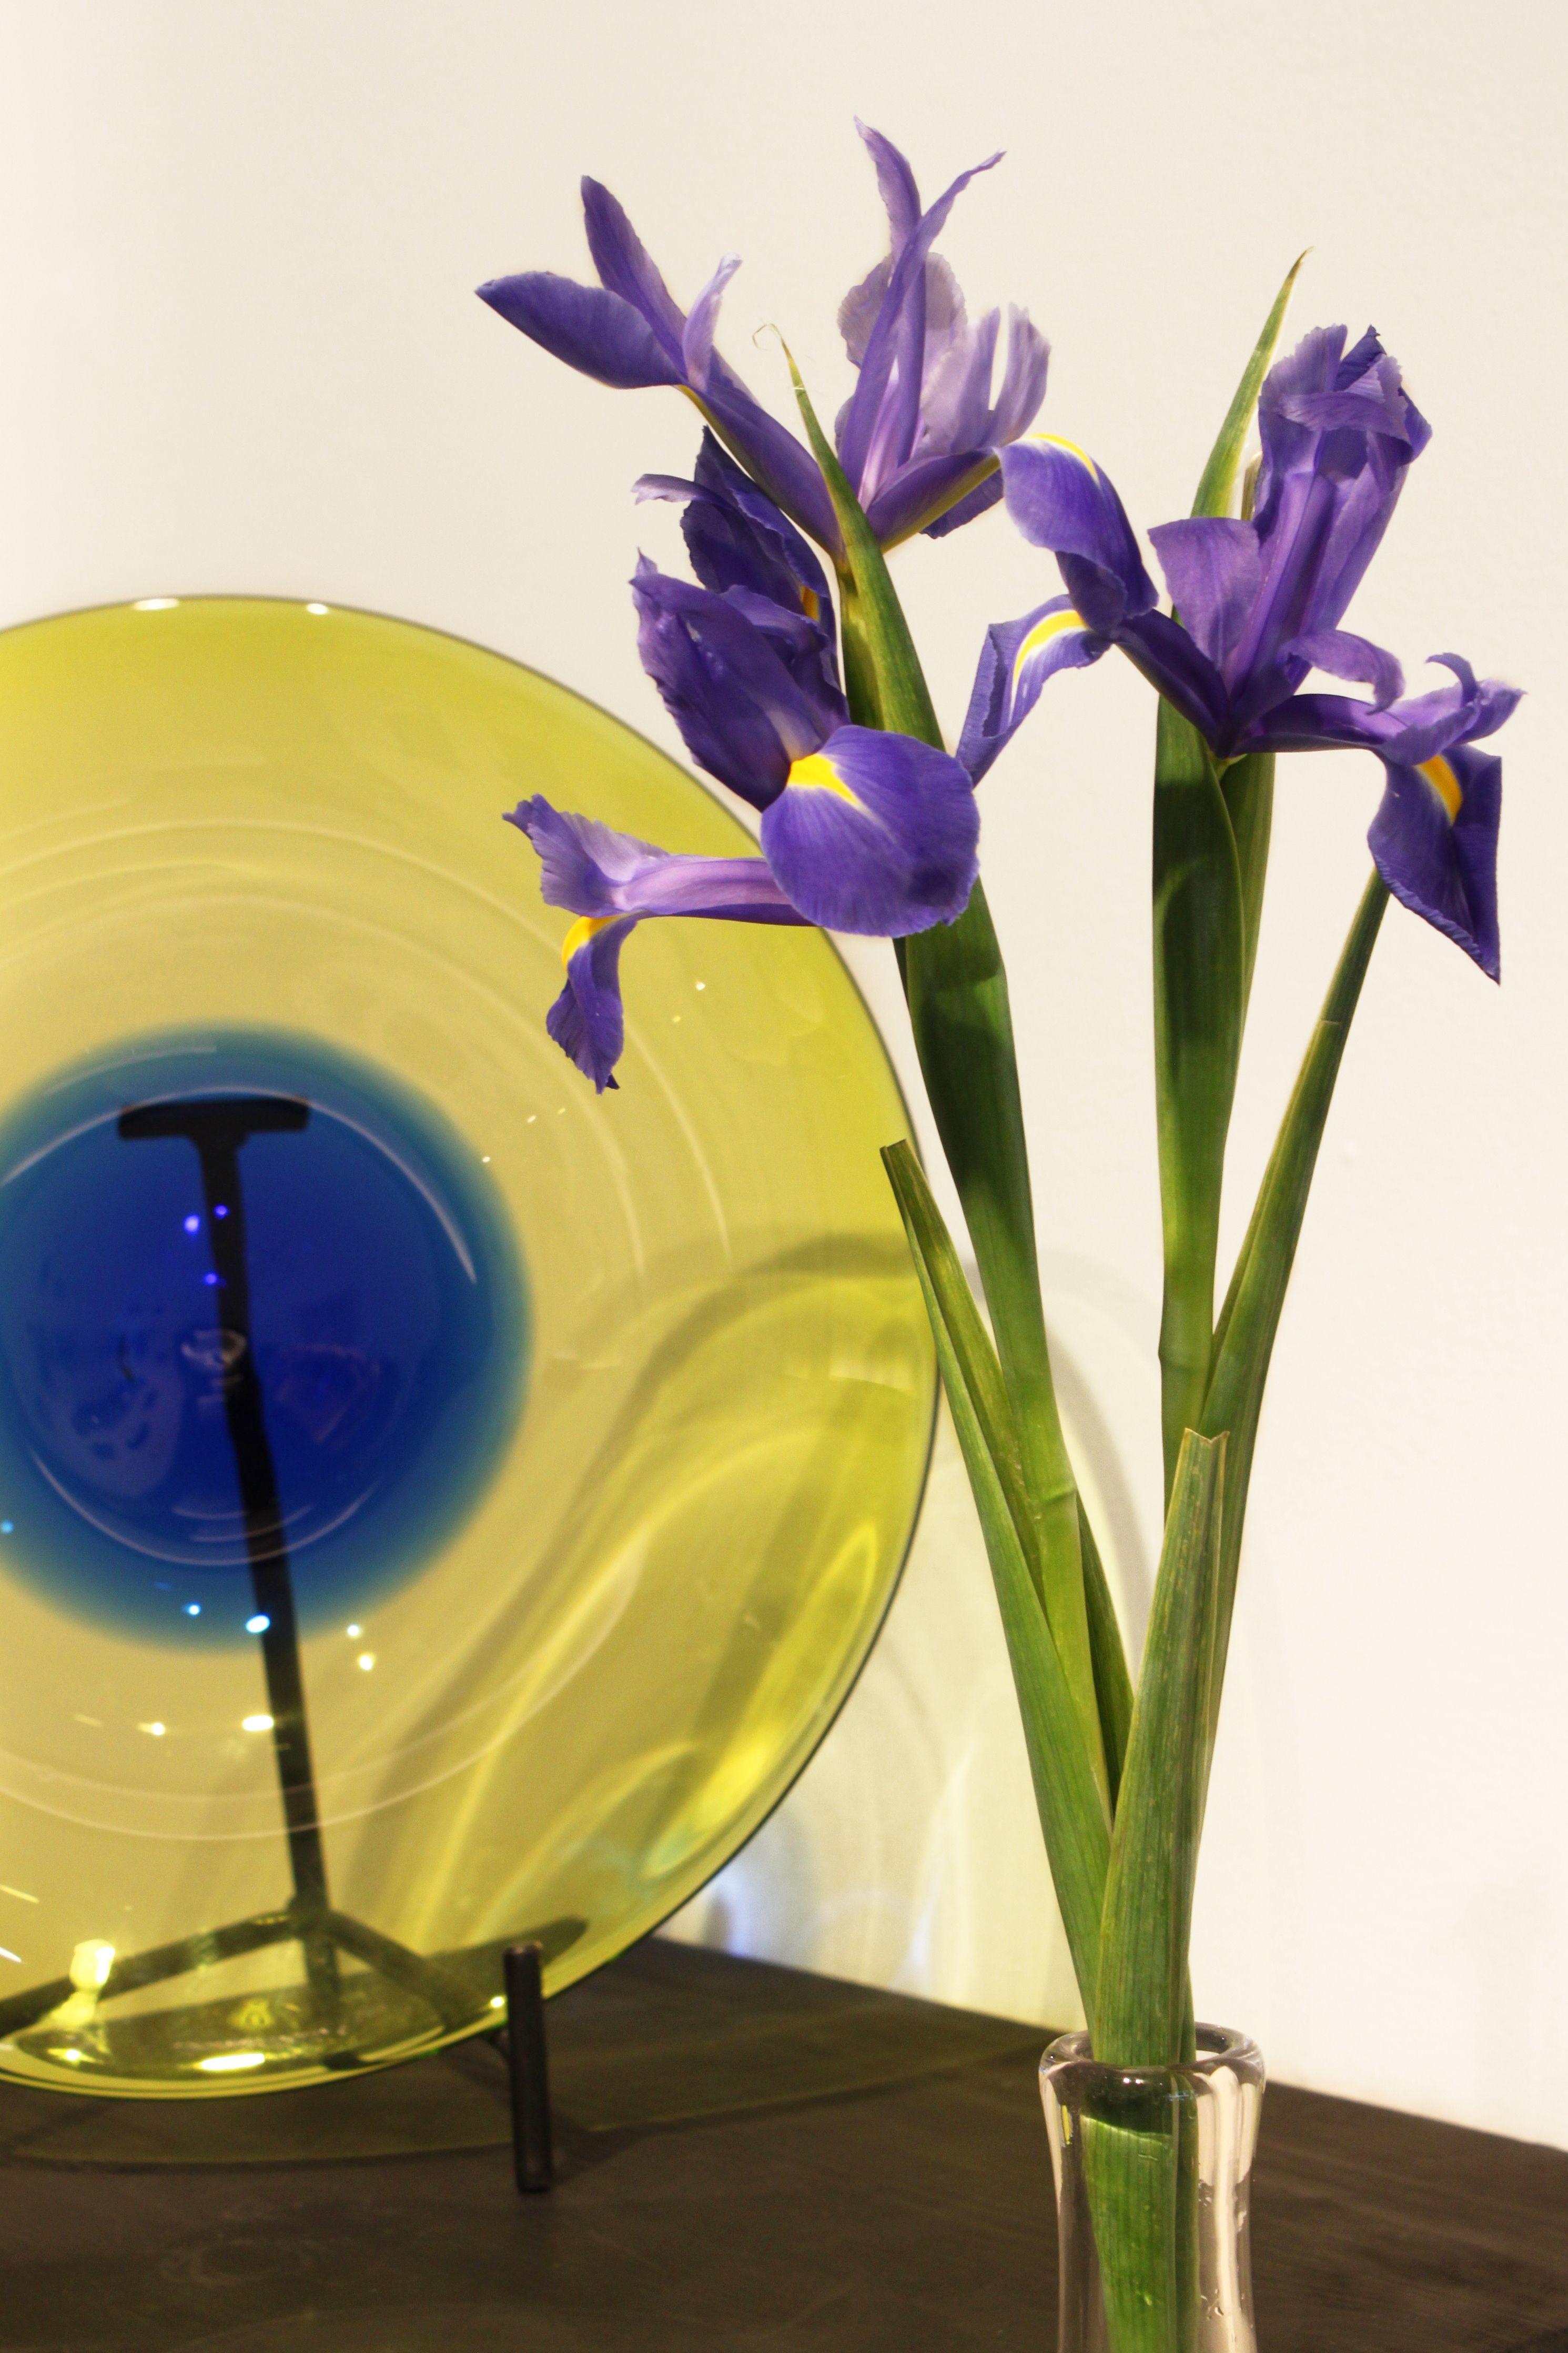 Unique glass plate by glass artist & master glassblower Kari Alakoski.